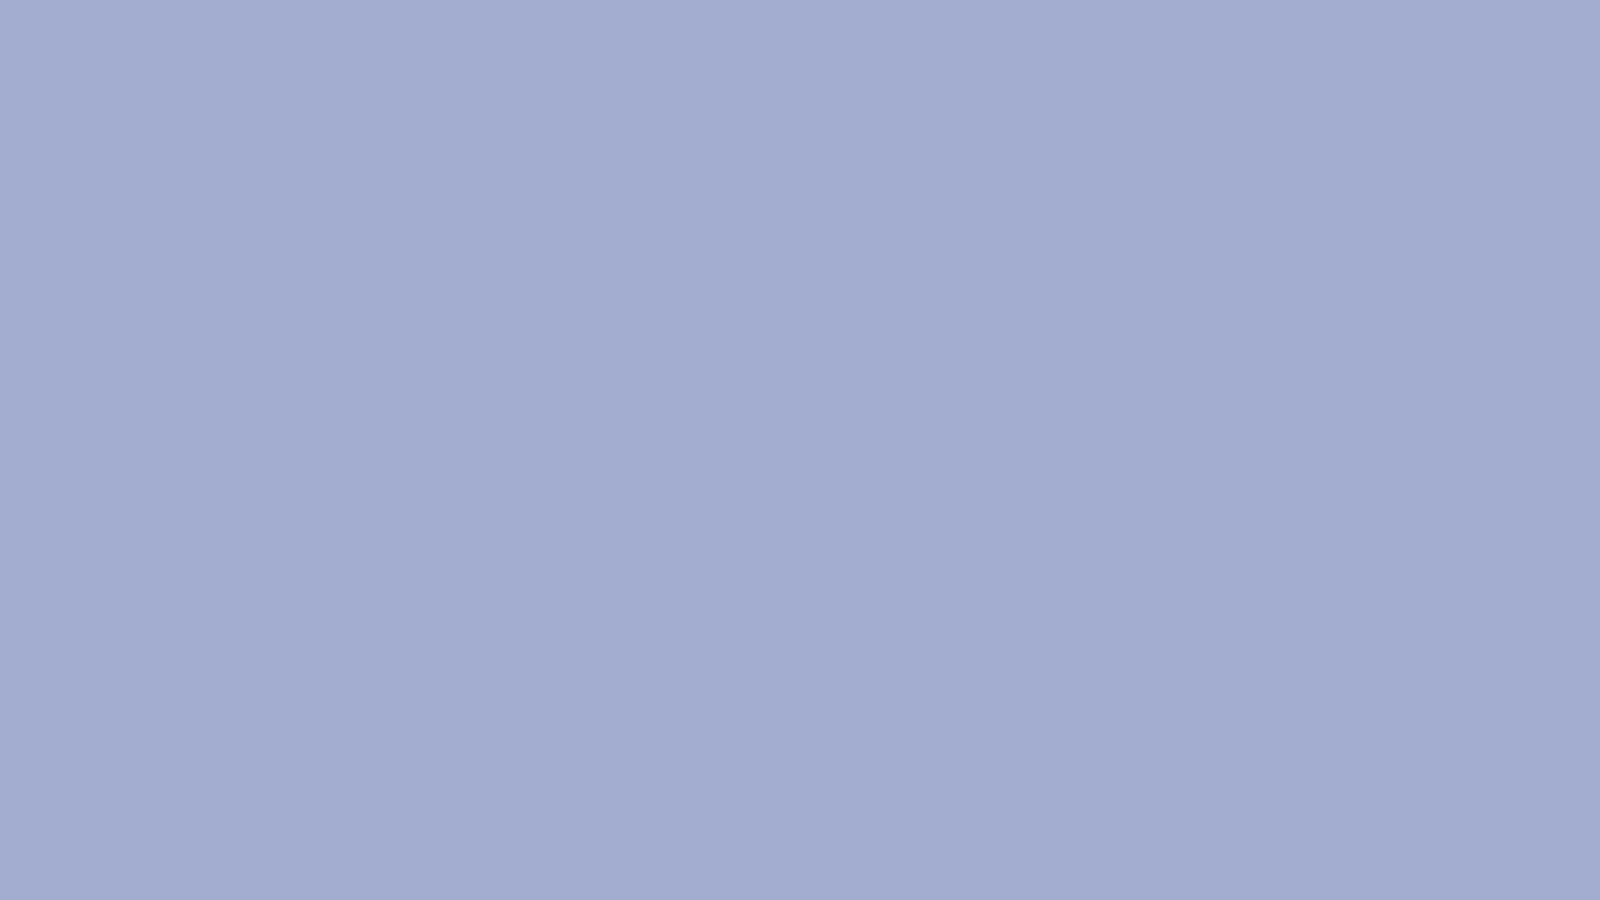 1600x900 Wild Blue Yonder Solid Color Background